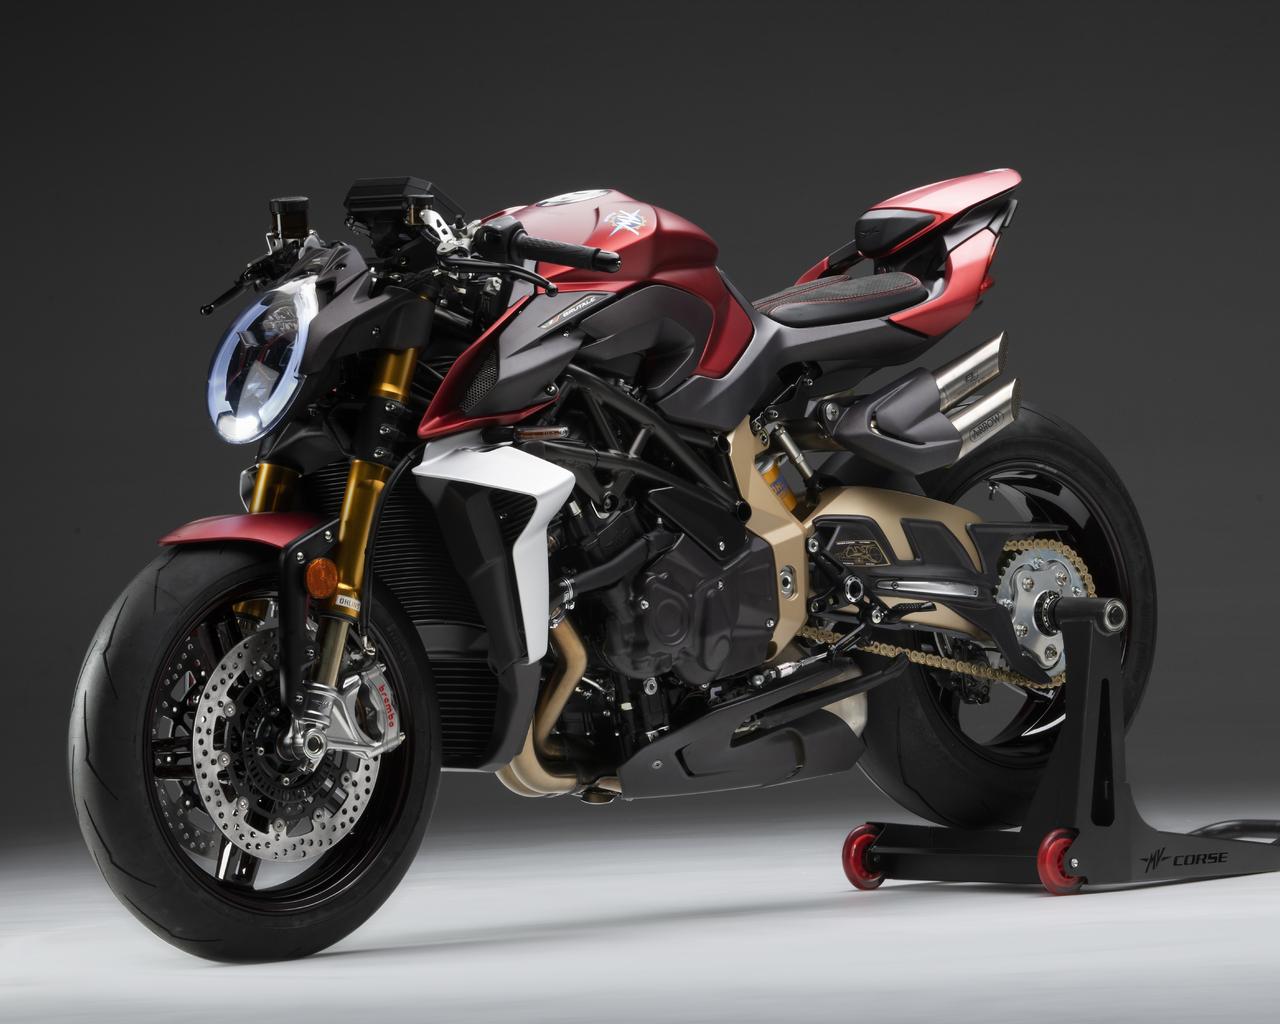 mv-agusta-brutale-1000-serie-oro-2020-w2.jpg